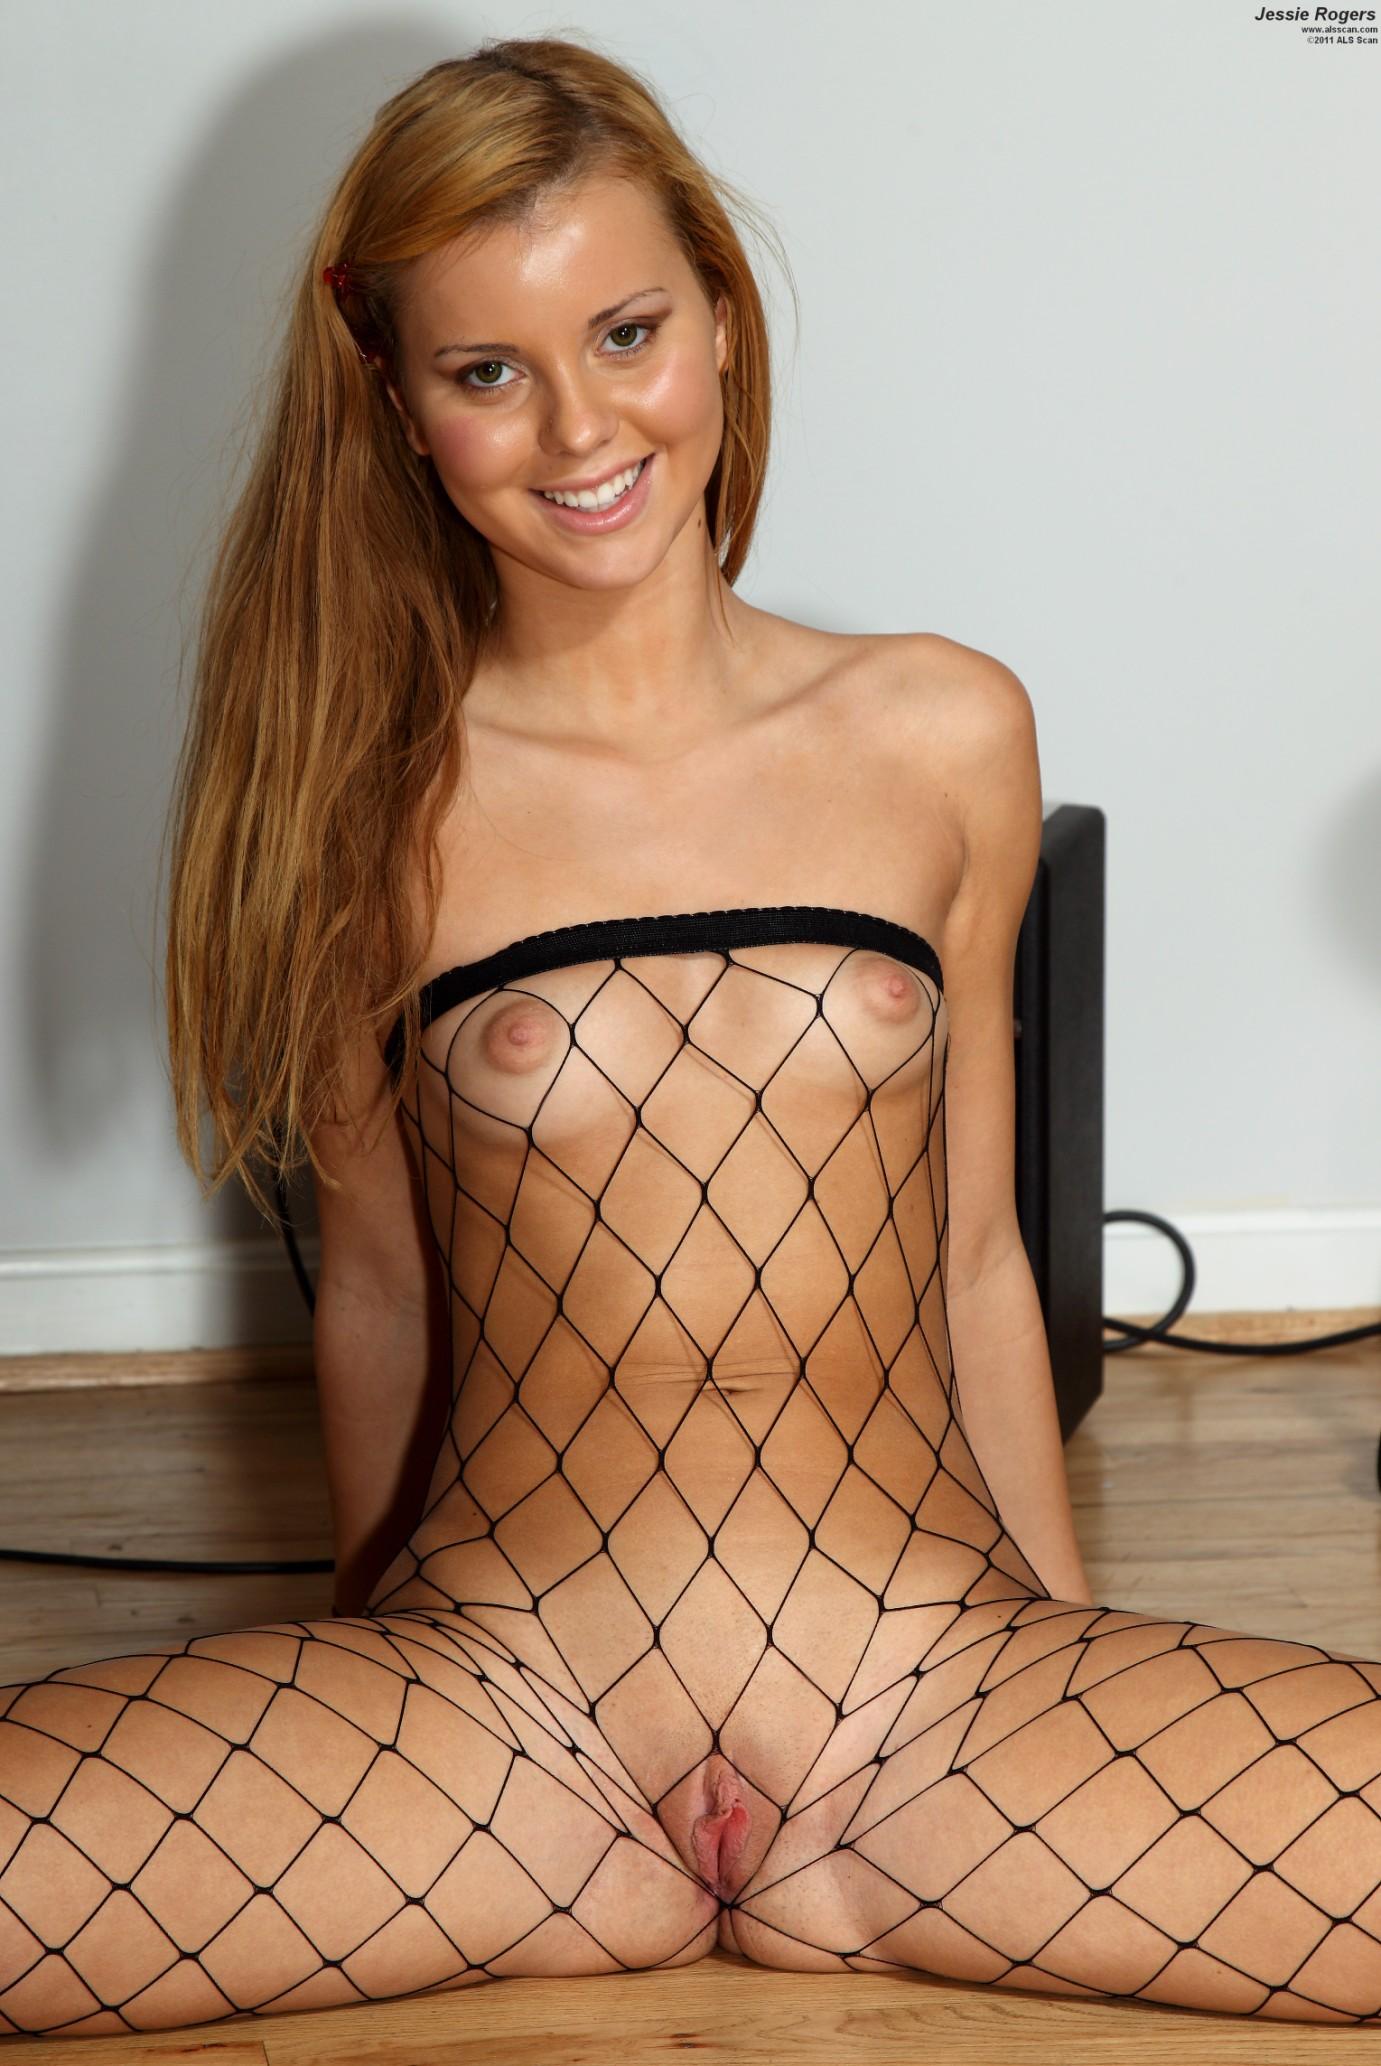 jessi rogers nude